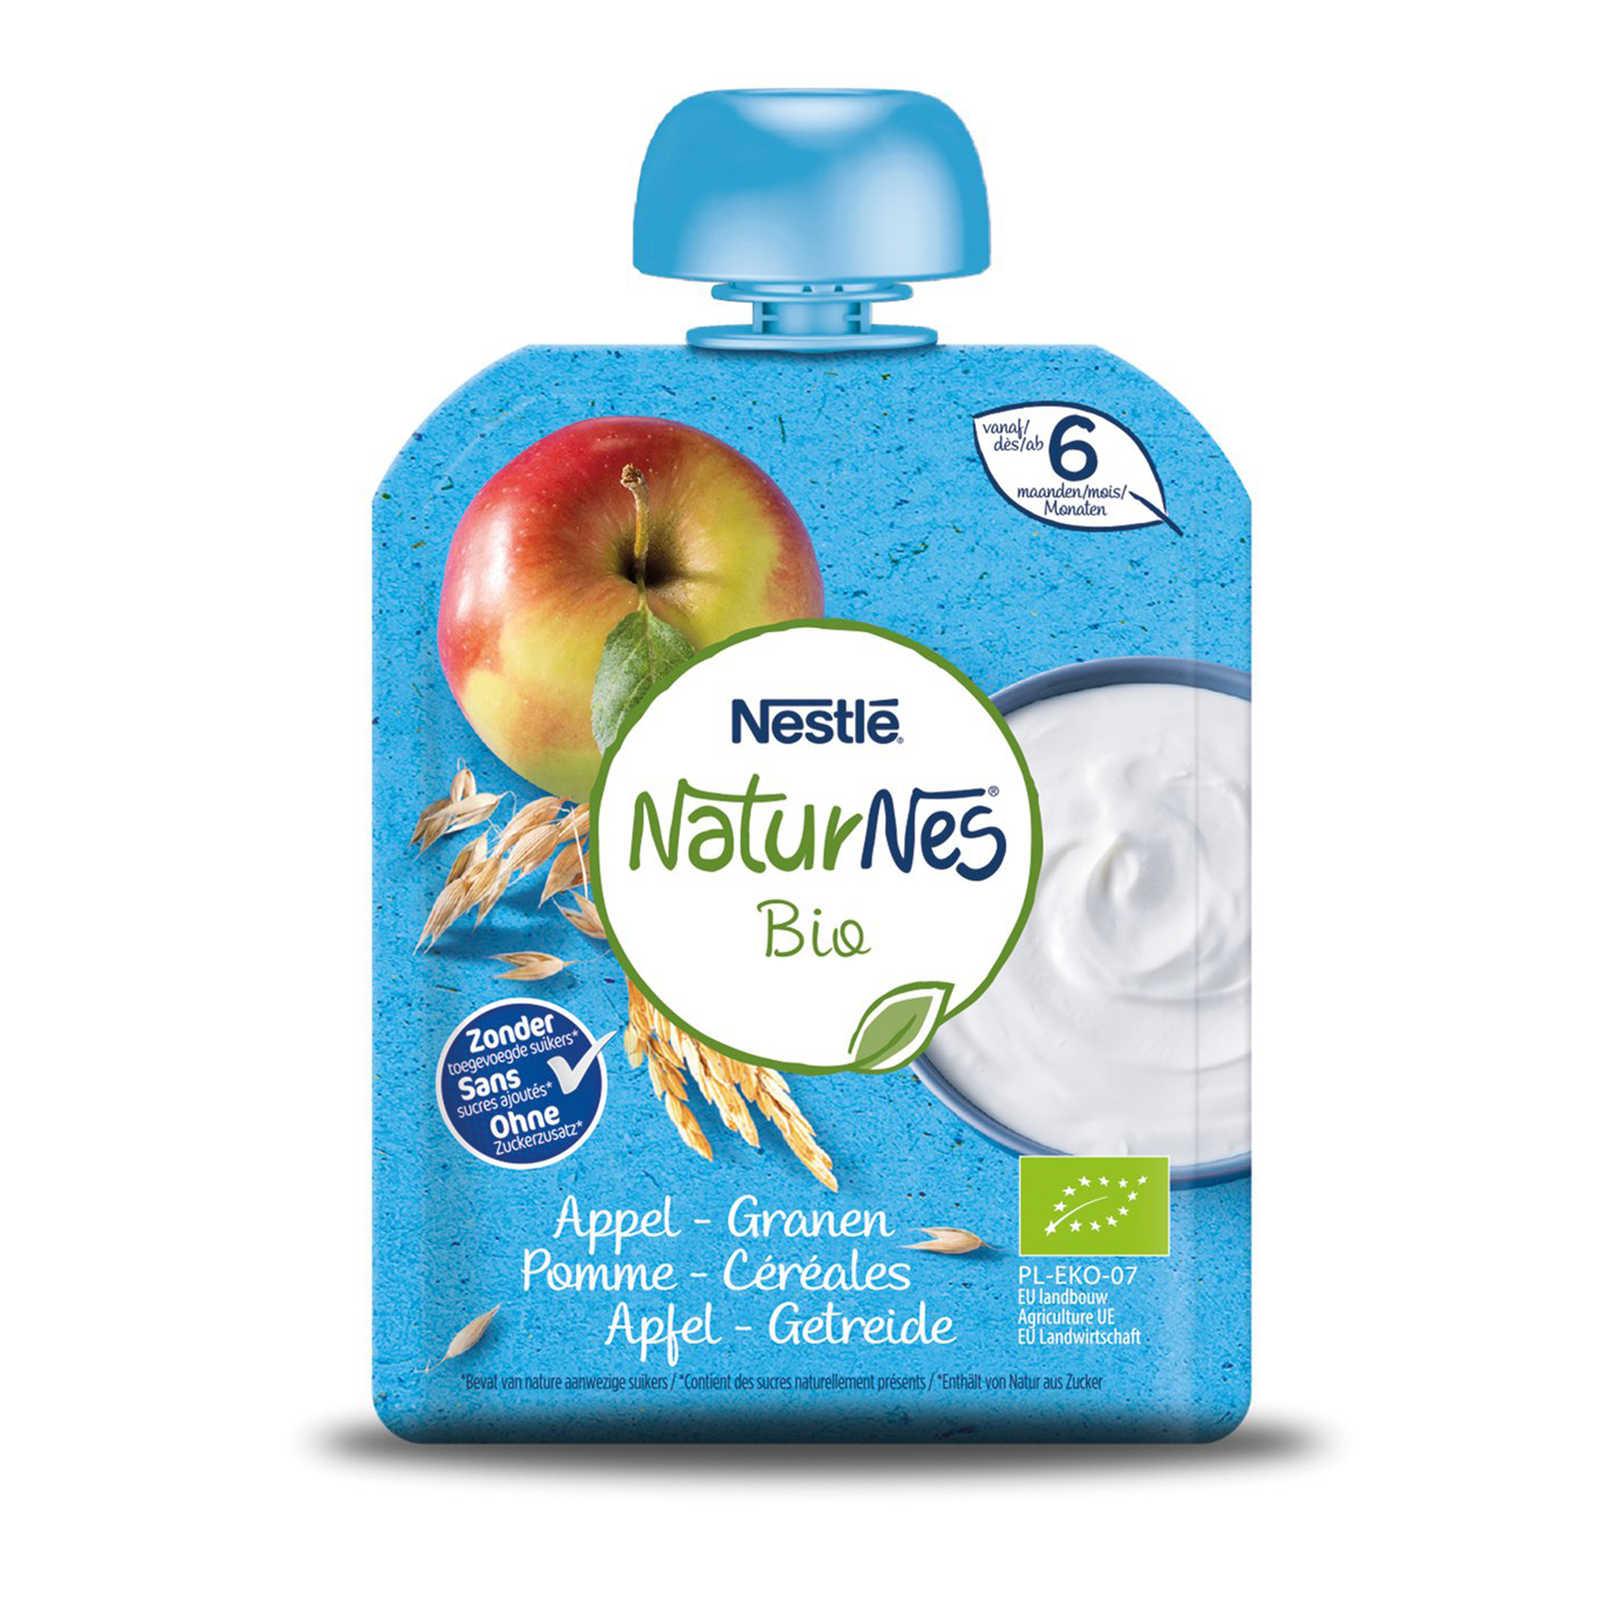 Nestlé-Naturnes